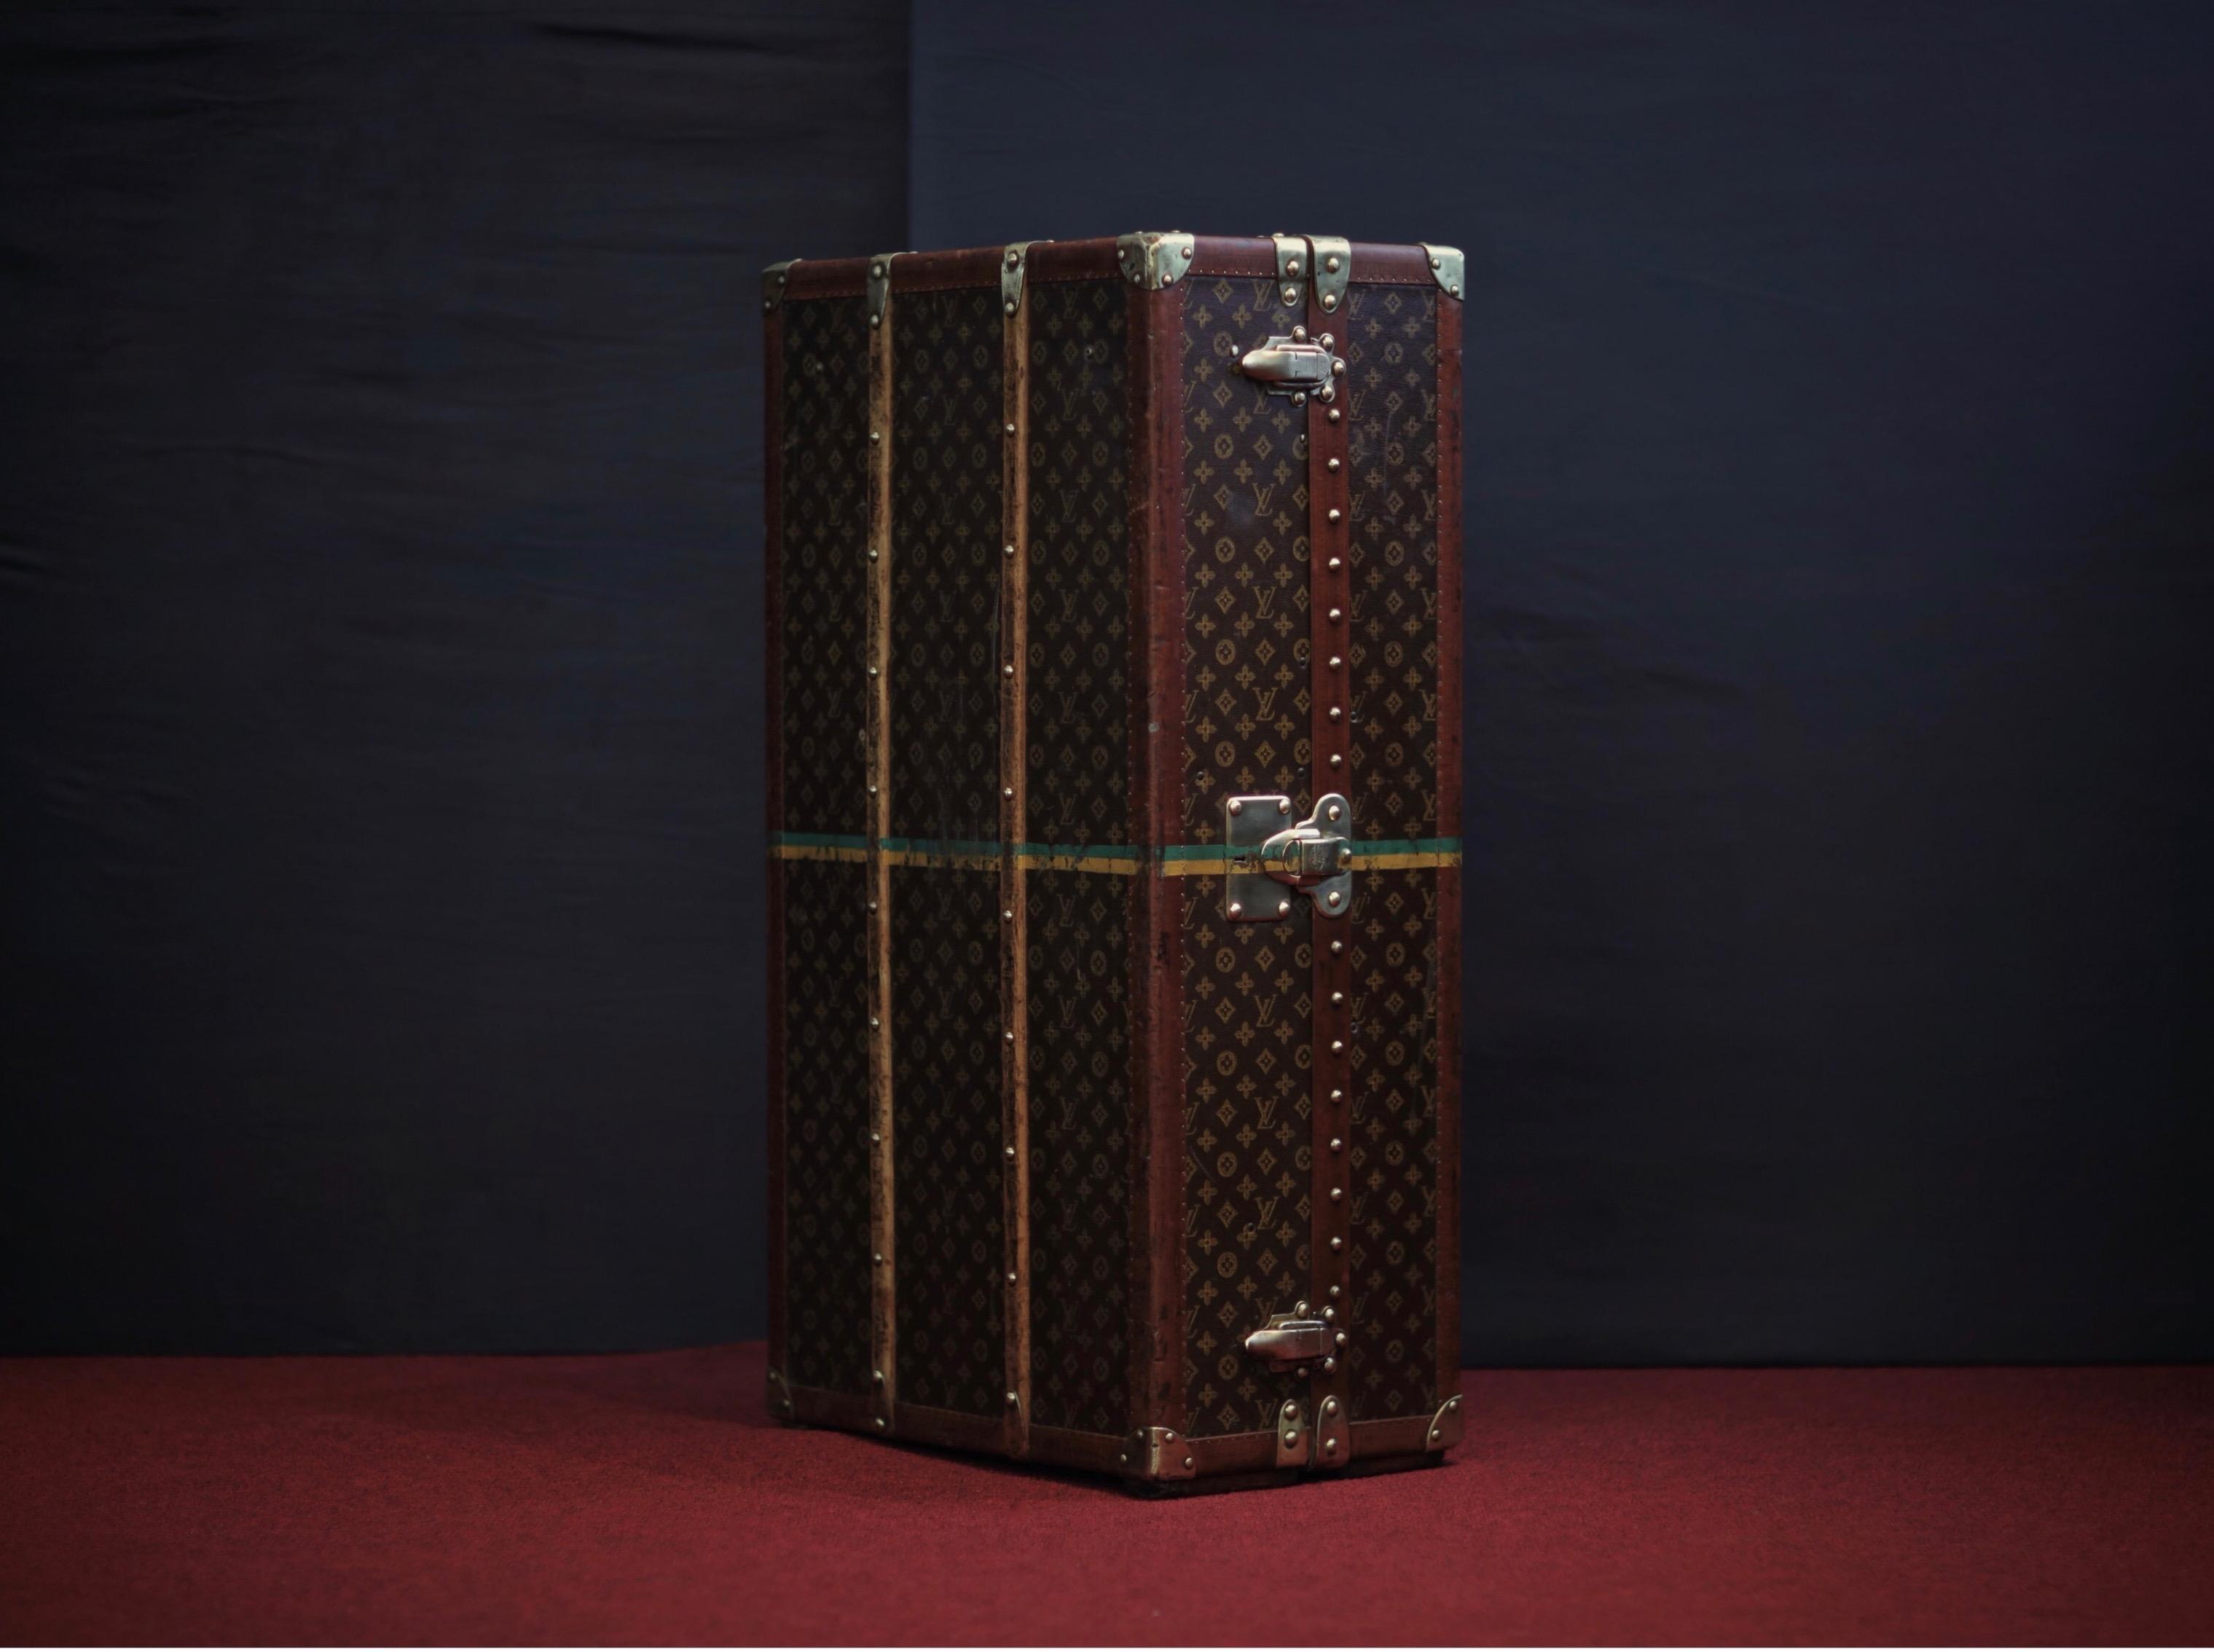 the-trunk-louis-vuitton-thumbnail-product-5640-1